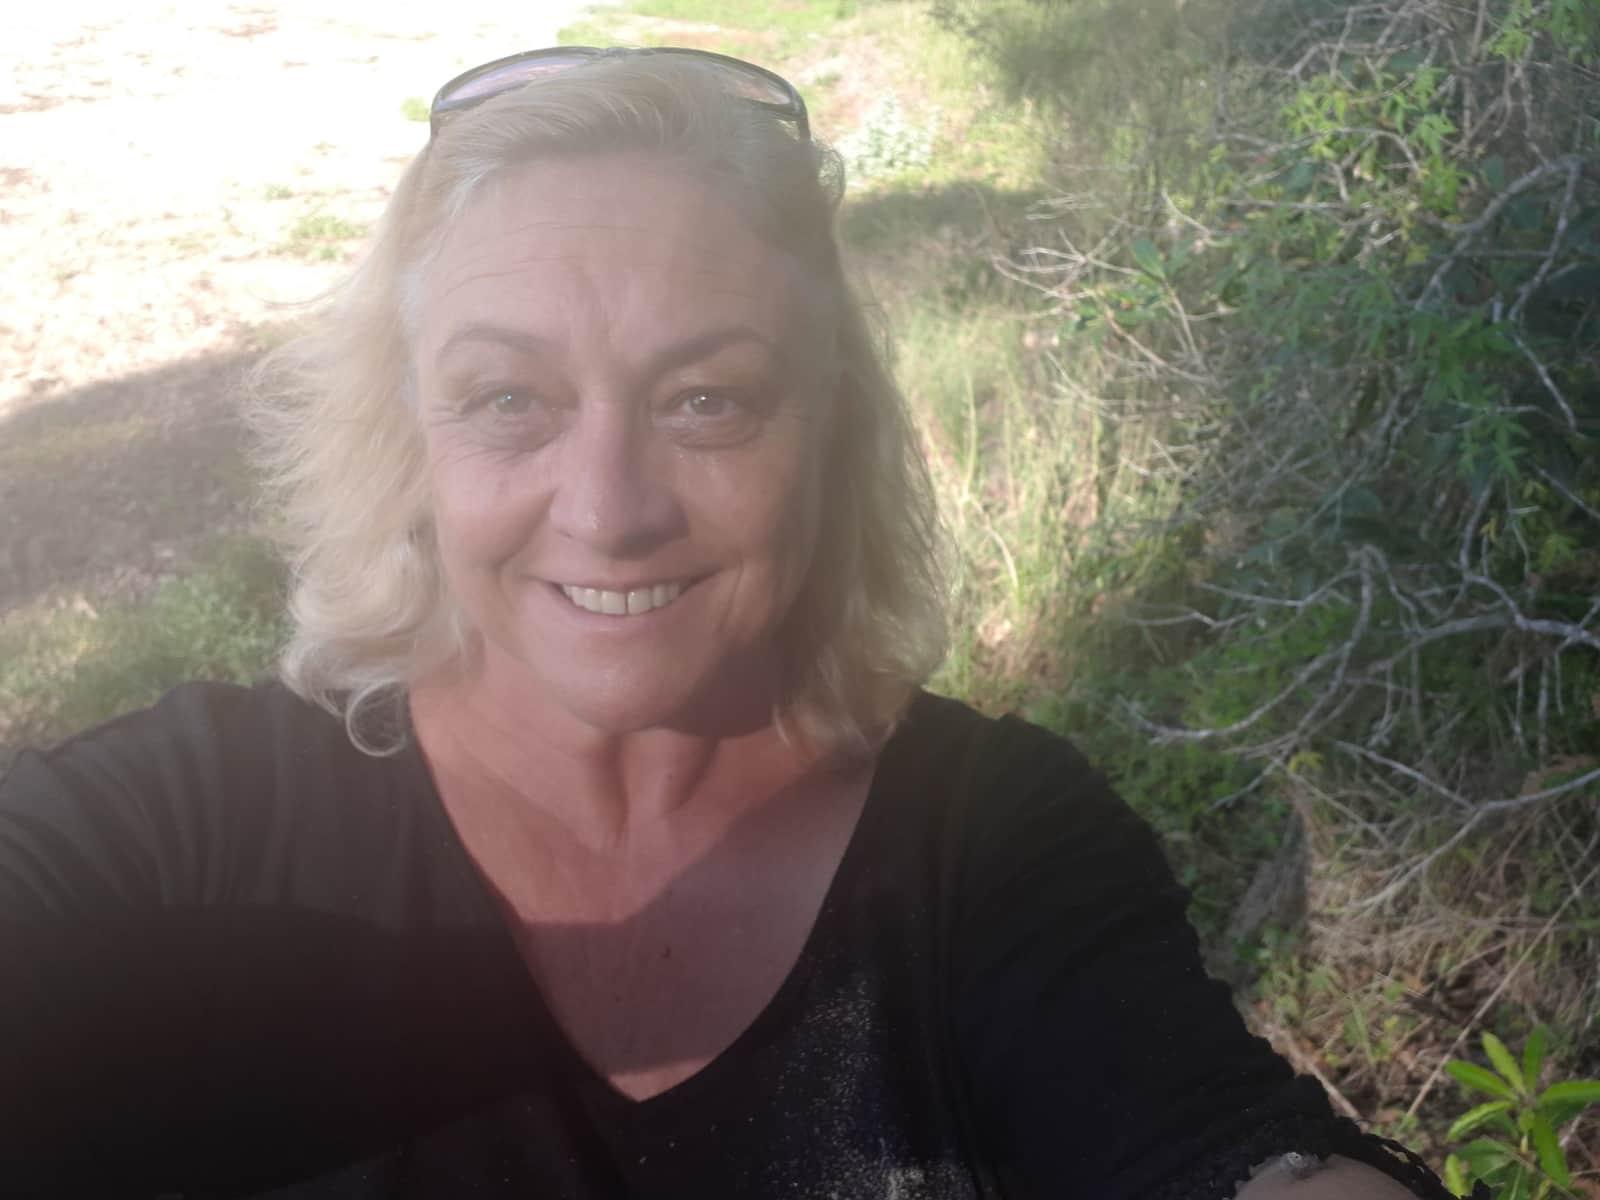 Cath from Canberra, Australian Capital Territory, Australia